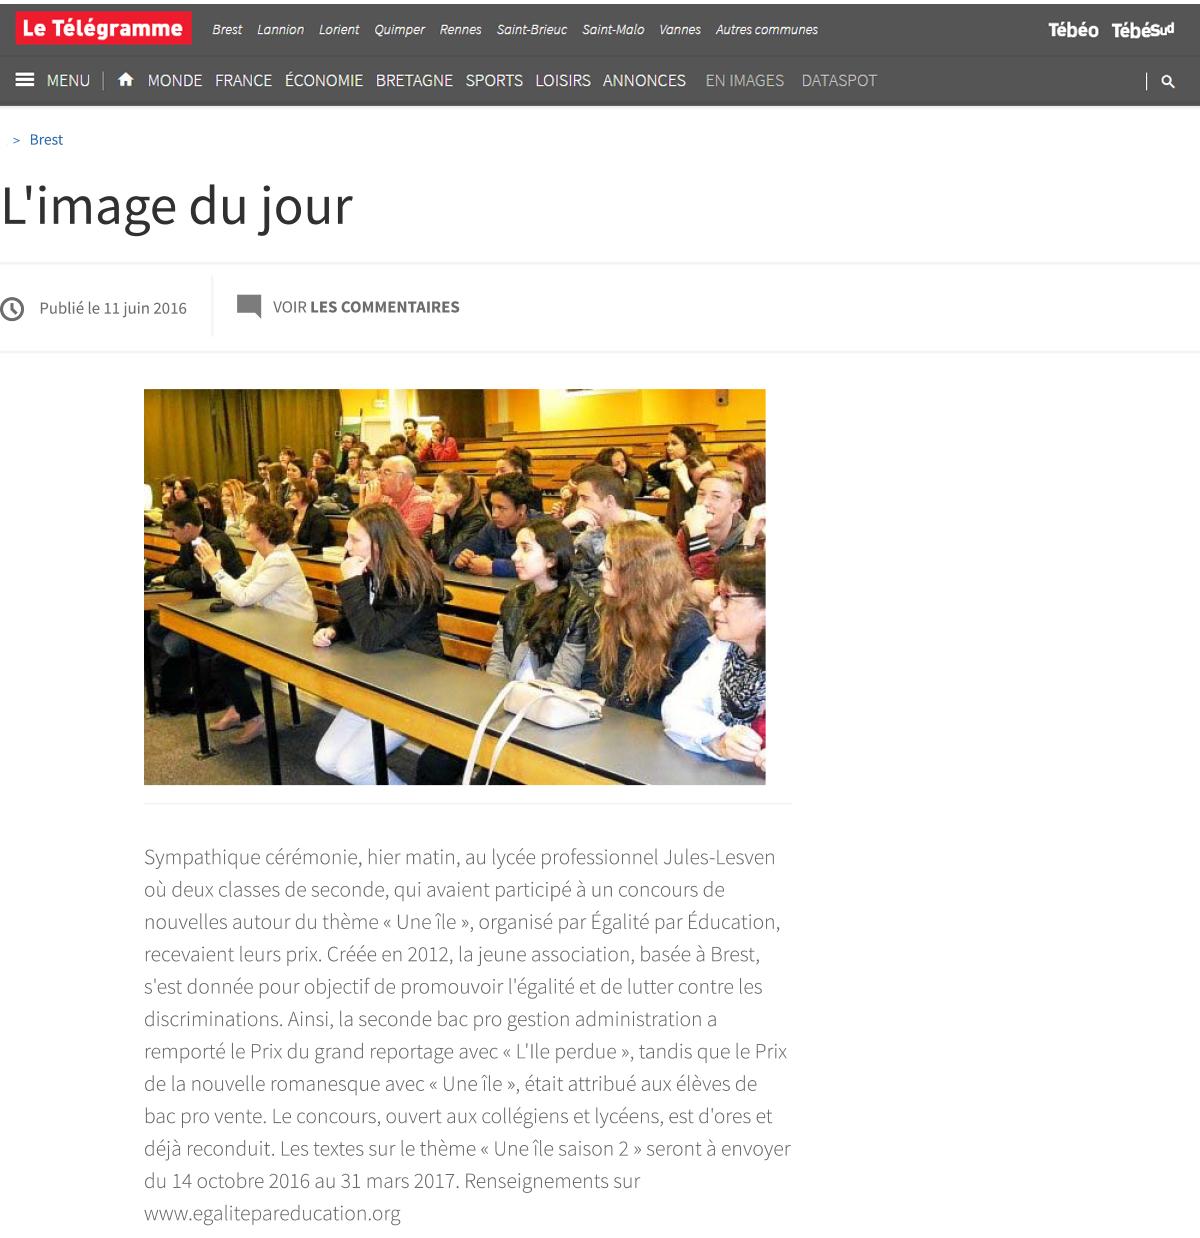 L'image-du-jour—Brest—LeTelegramme